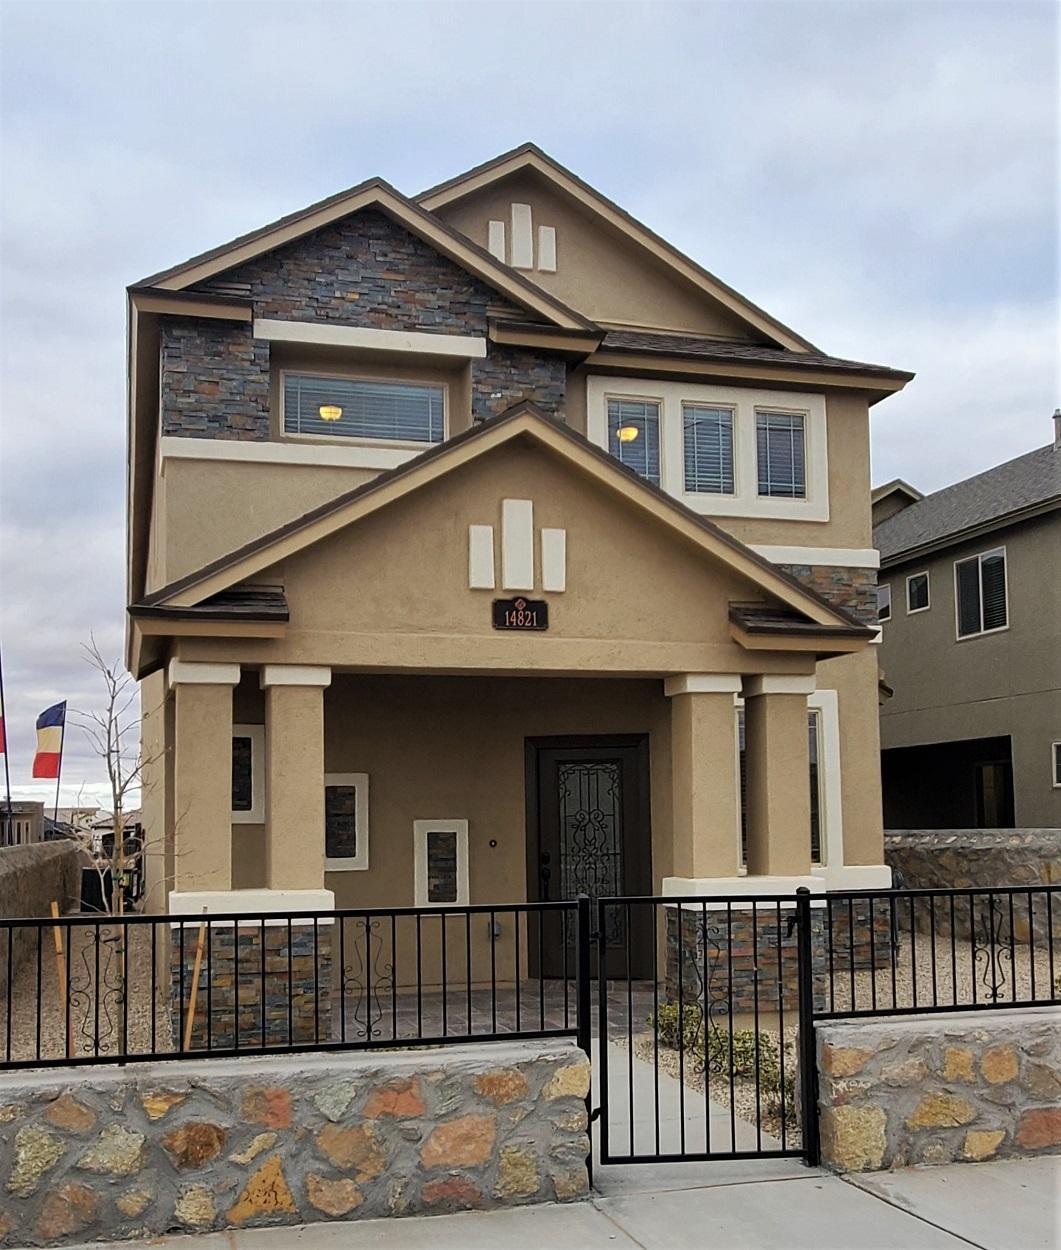 14821 Pebble Hills, El Paso, Texas 79938, 5 Bedrooms Bedrooms, ,4 BathroomsBathrooms,Residential,For sale,Pebble Hills,840017